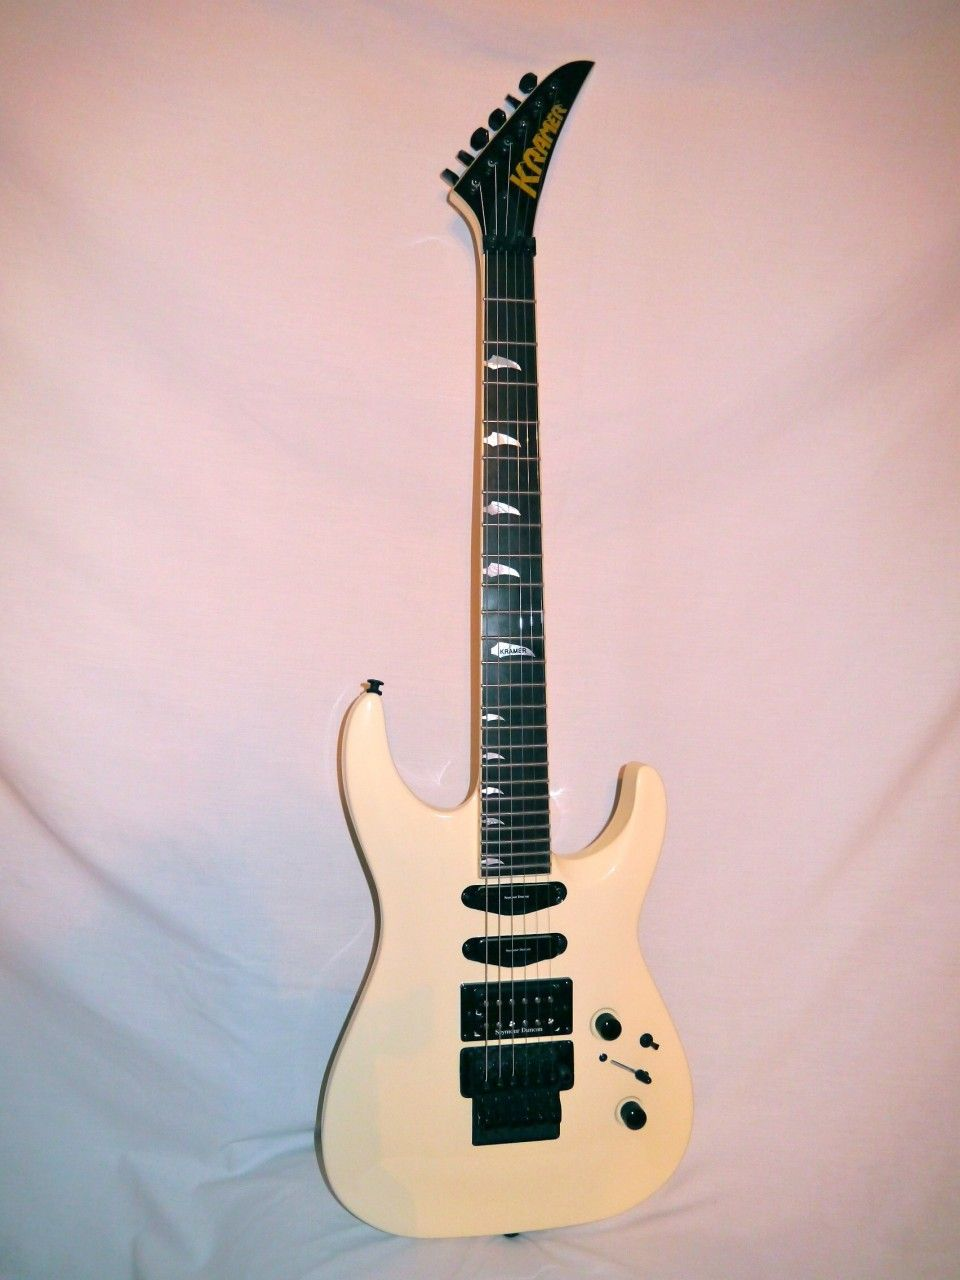 Indian Creek Guitars - Kramer SM-1 Seymour Duncan Vintage White, (http://www.indiancreekguitars.com/kramer-sm-1-seymour-duncan-vintage-white/)